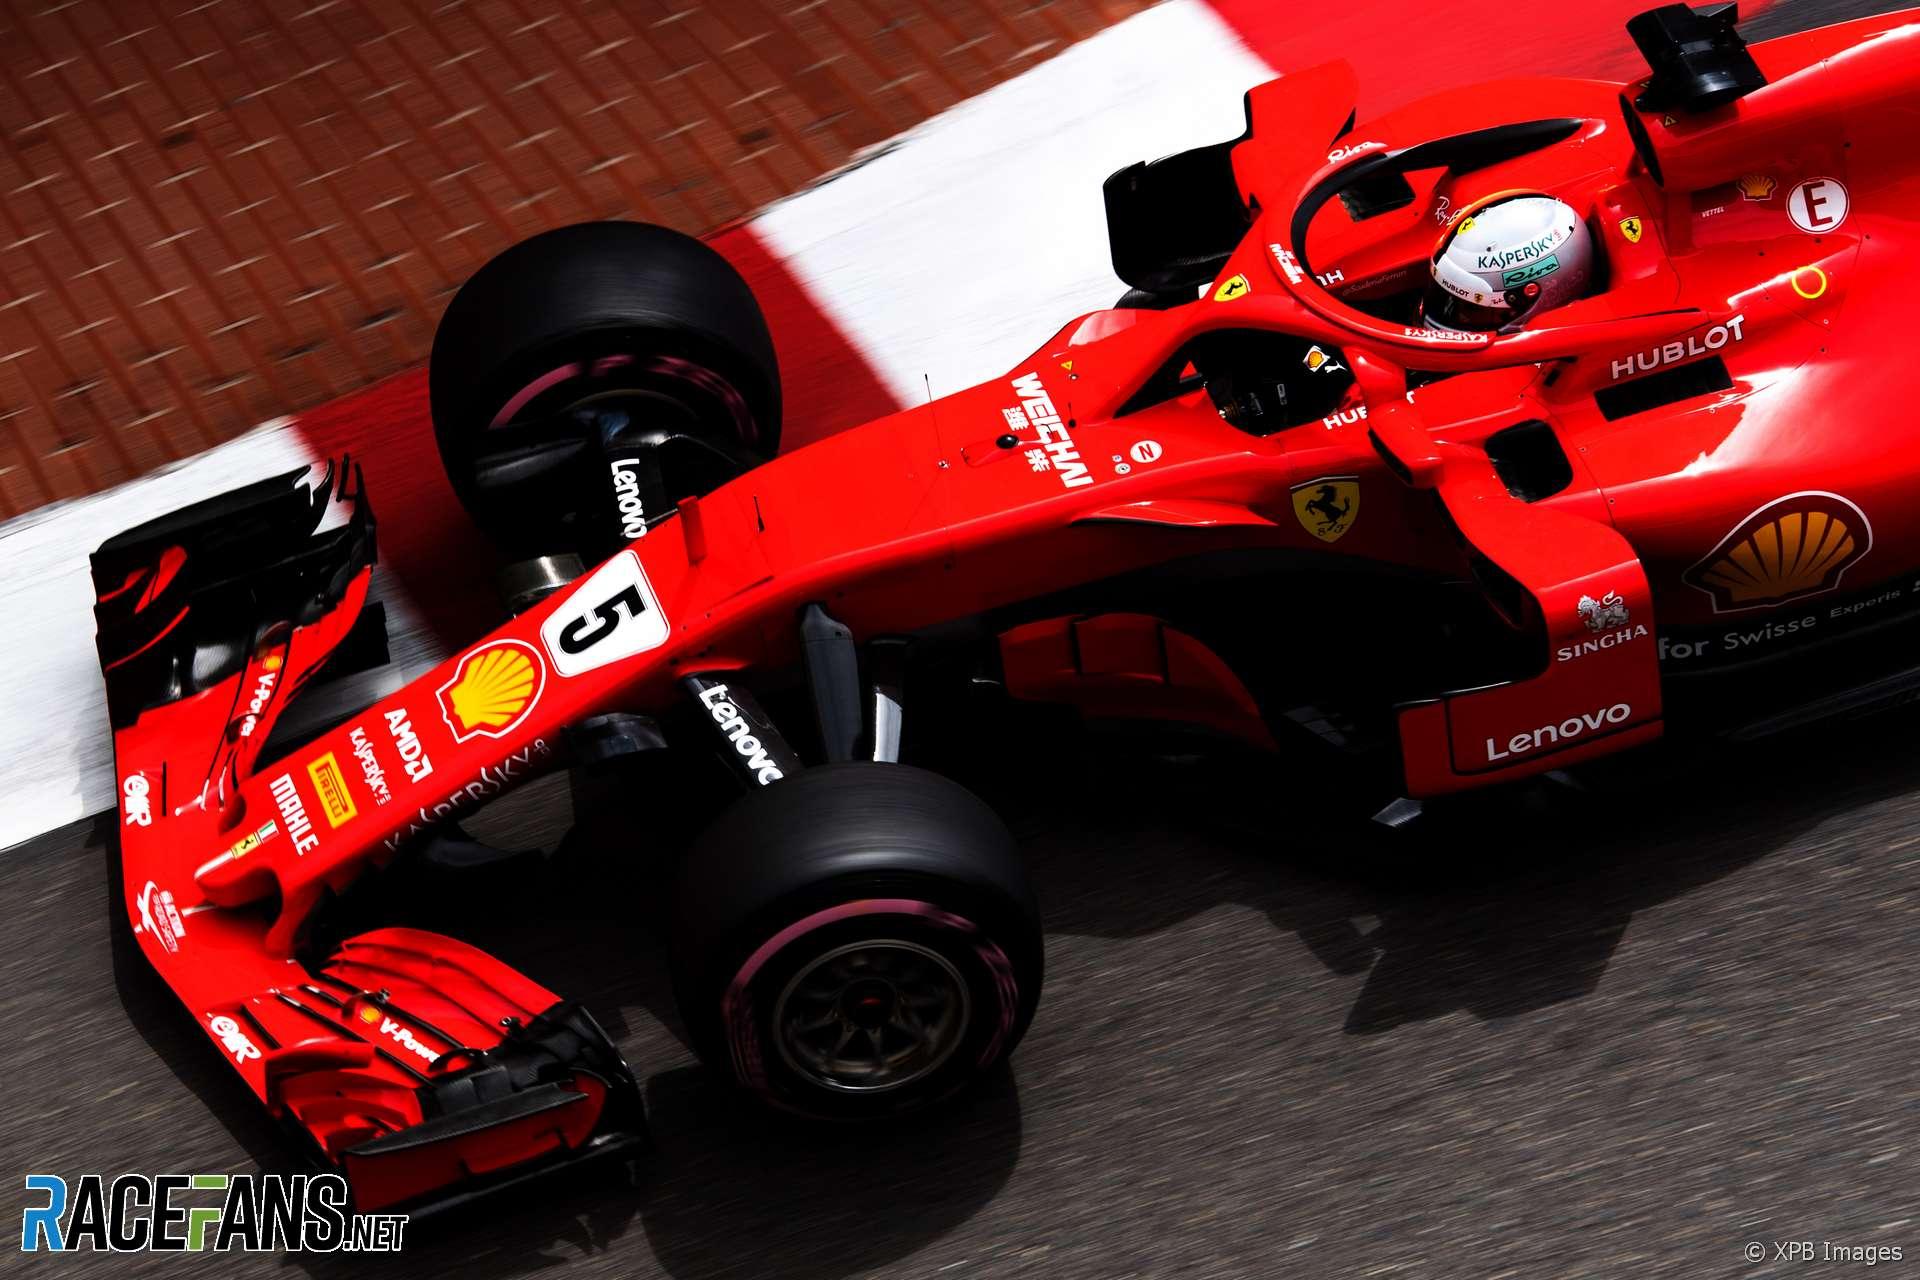 Sebastian Vettel, Ferrari, Monaco, 2018